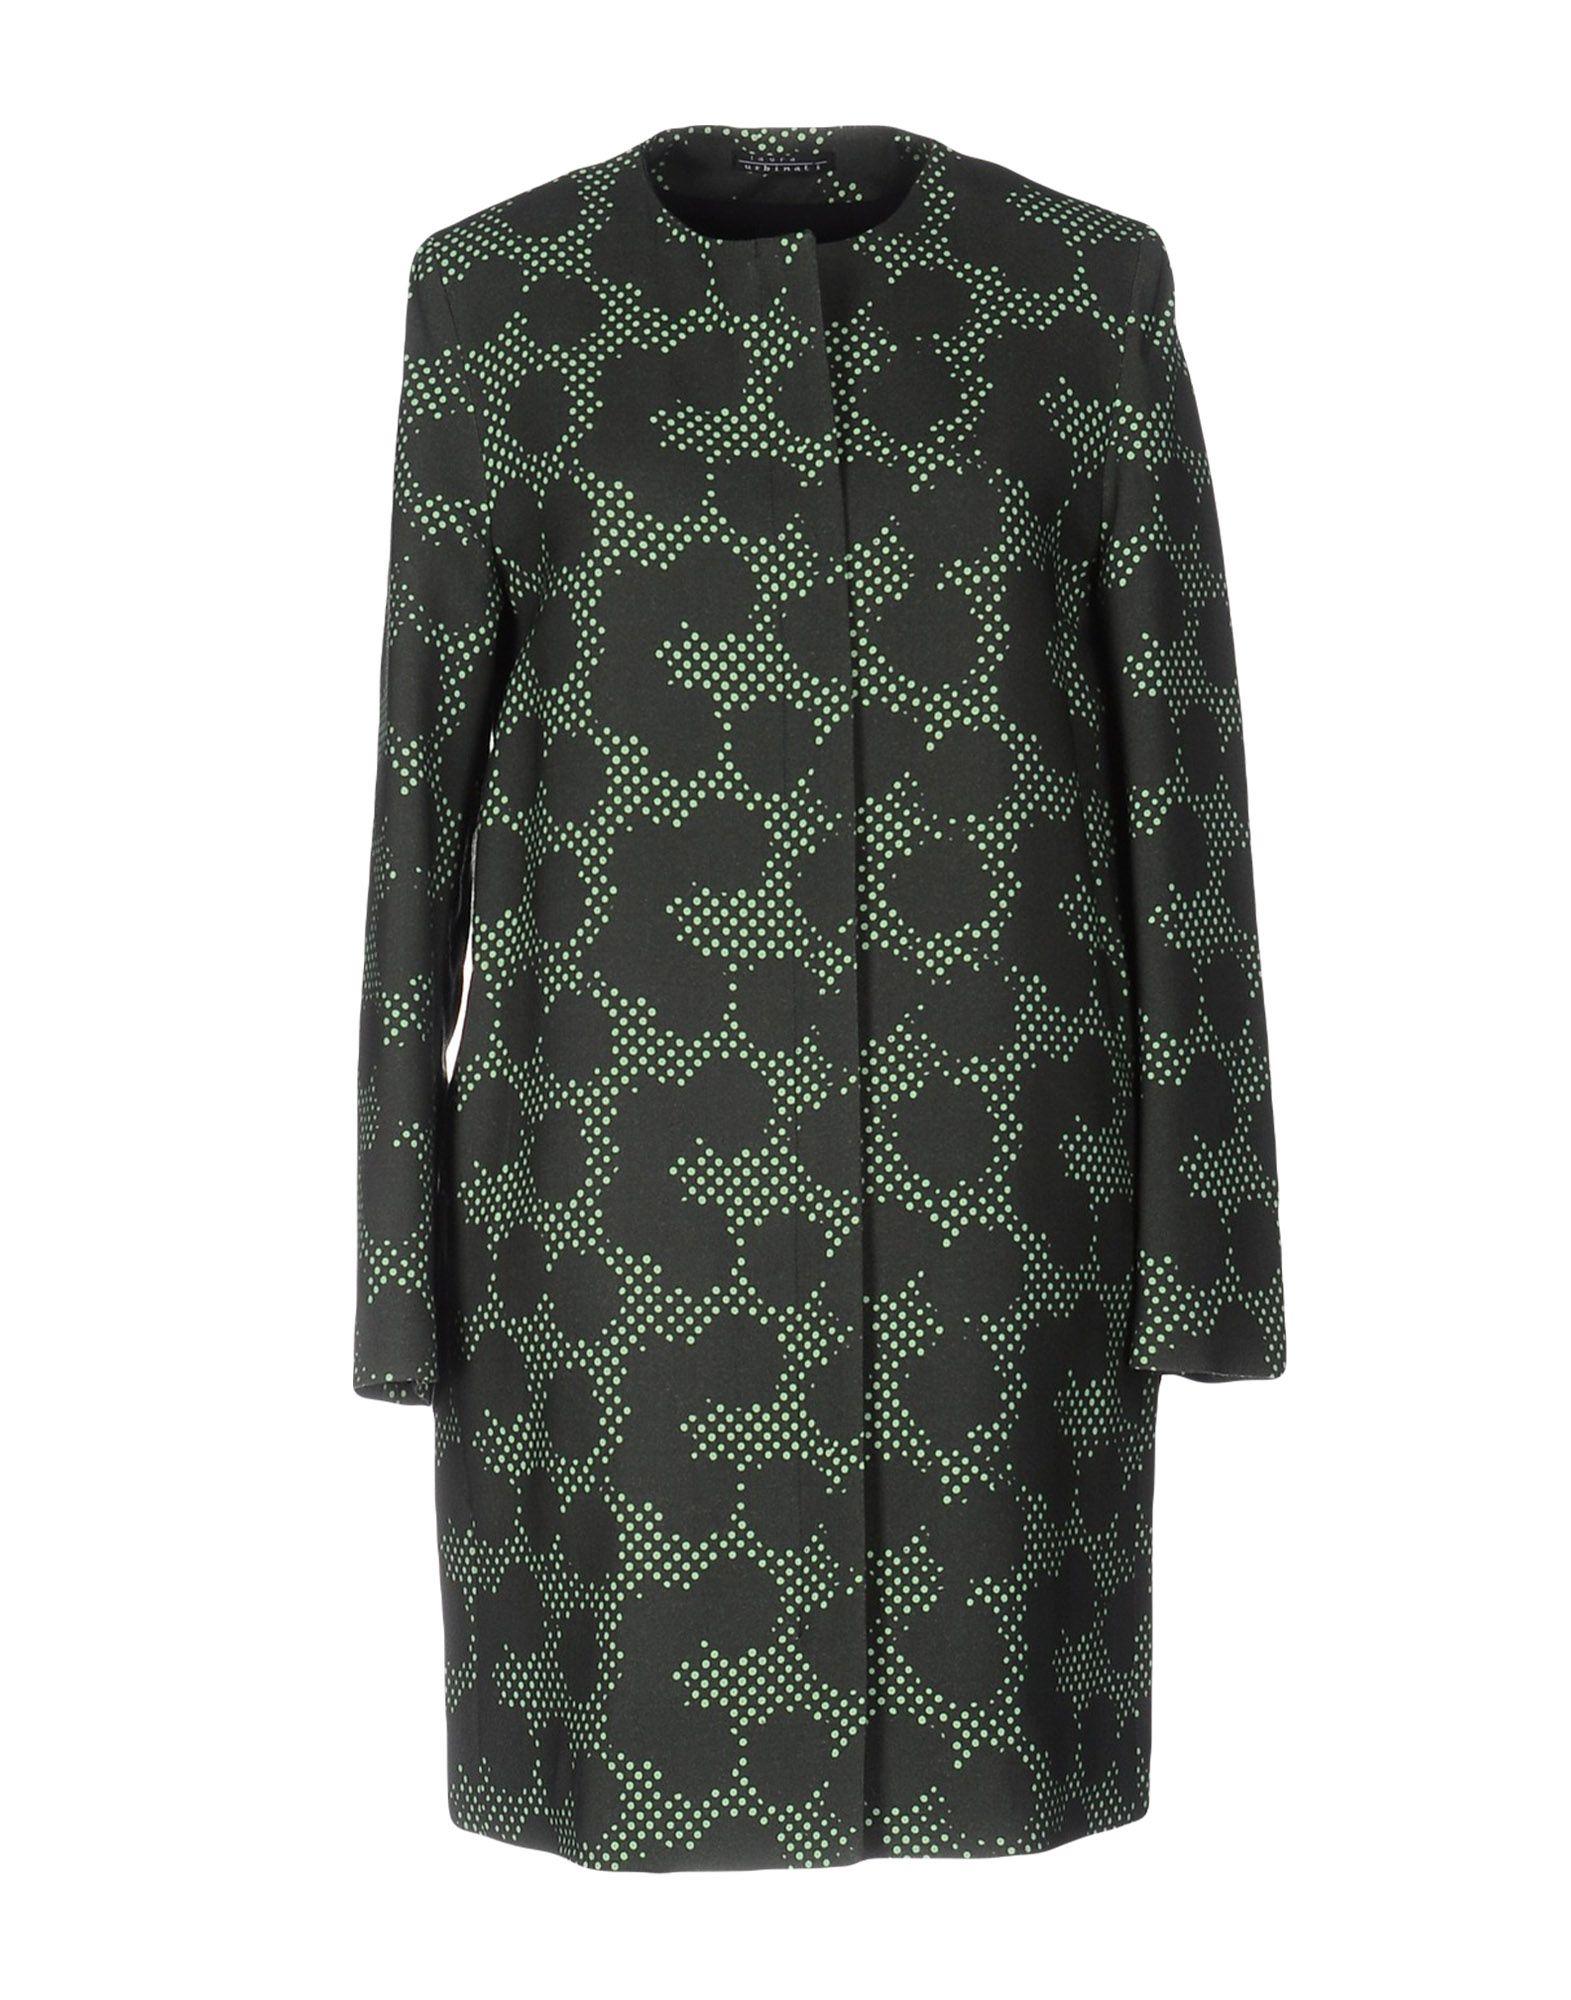 LAURA URBINATI Full-Length Jacket in Dark Green